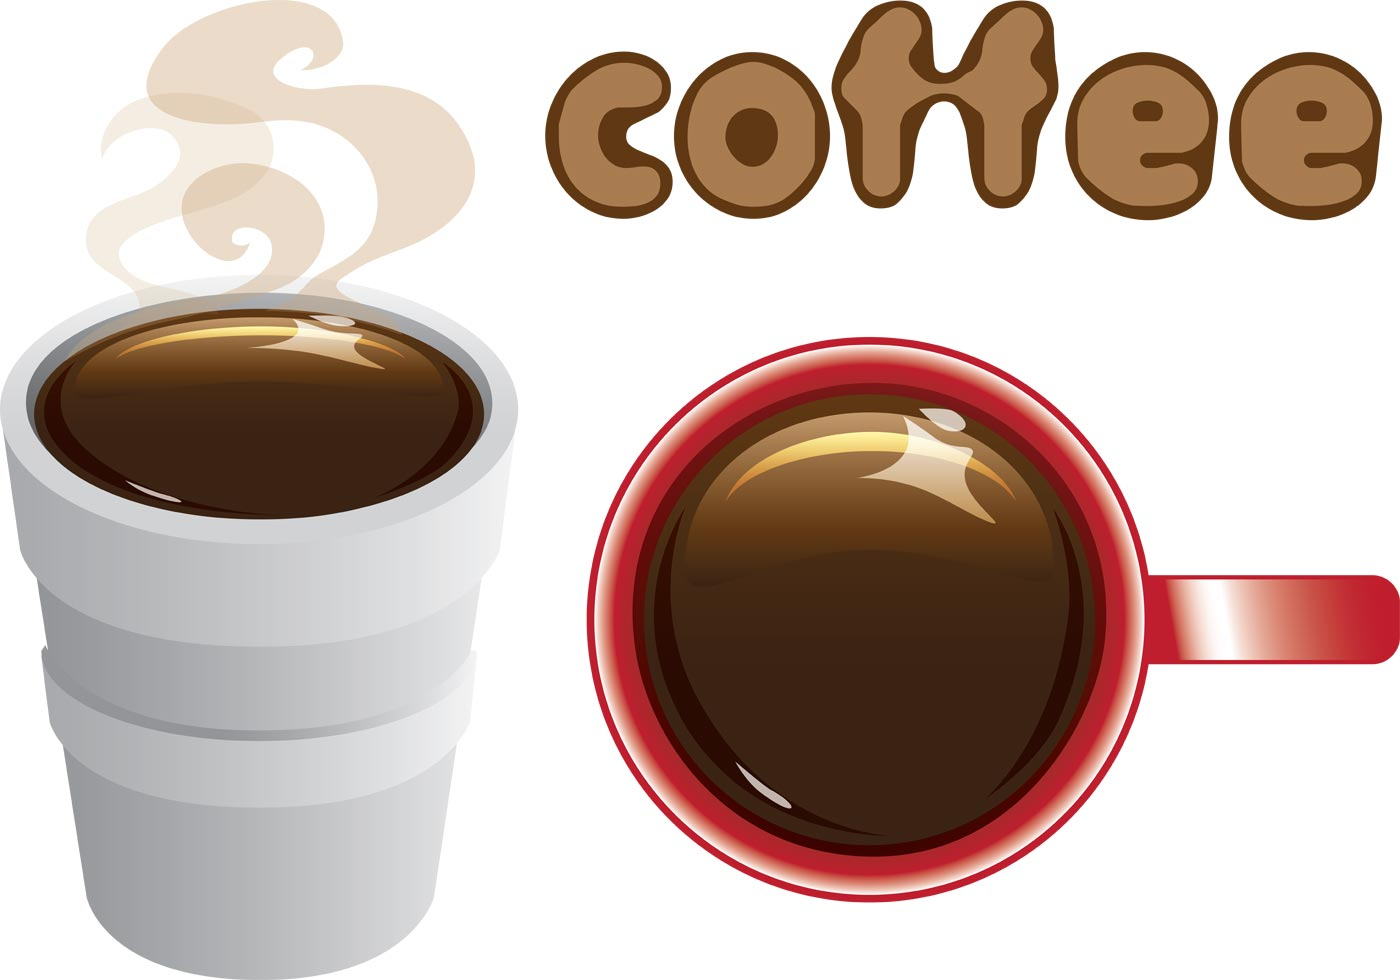 Coffee cup vector free - Coffee Cup Vector Free 70